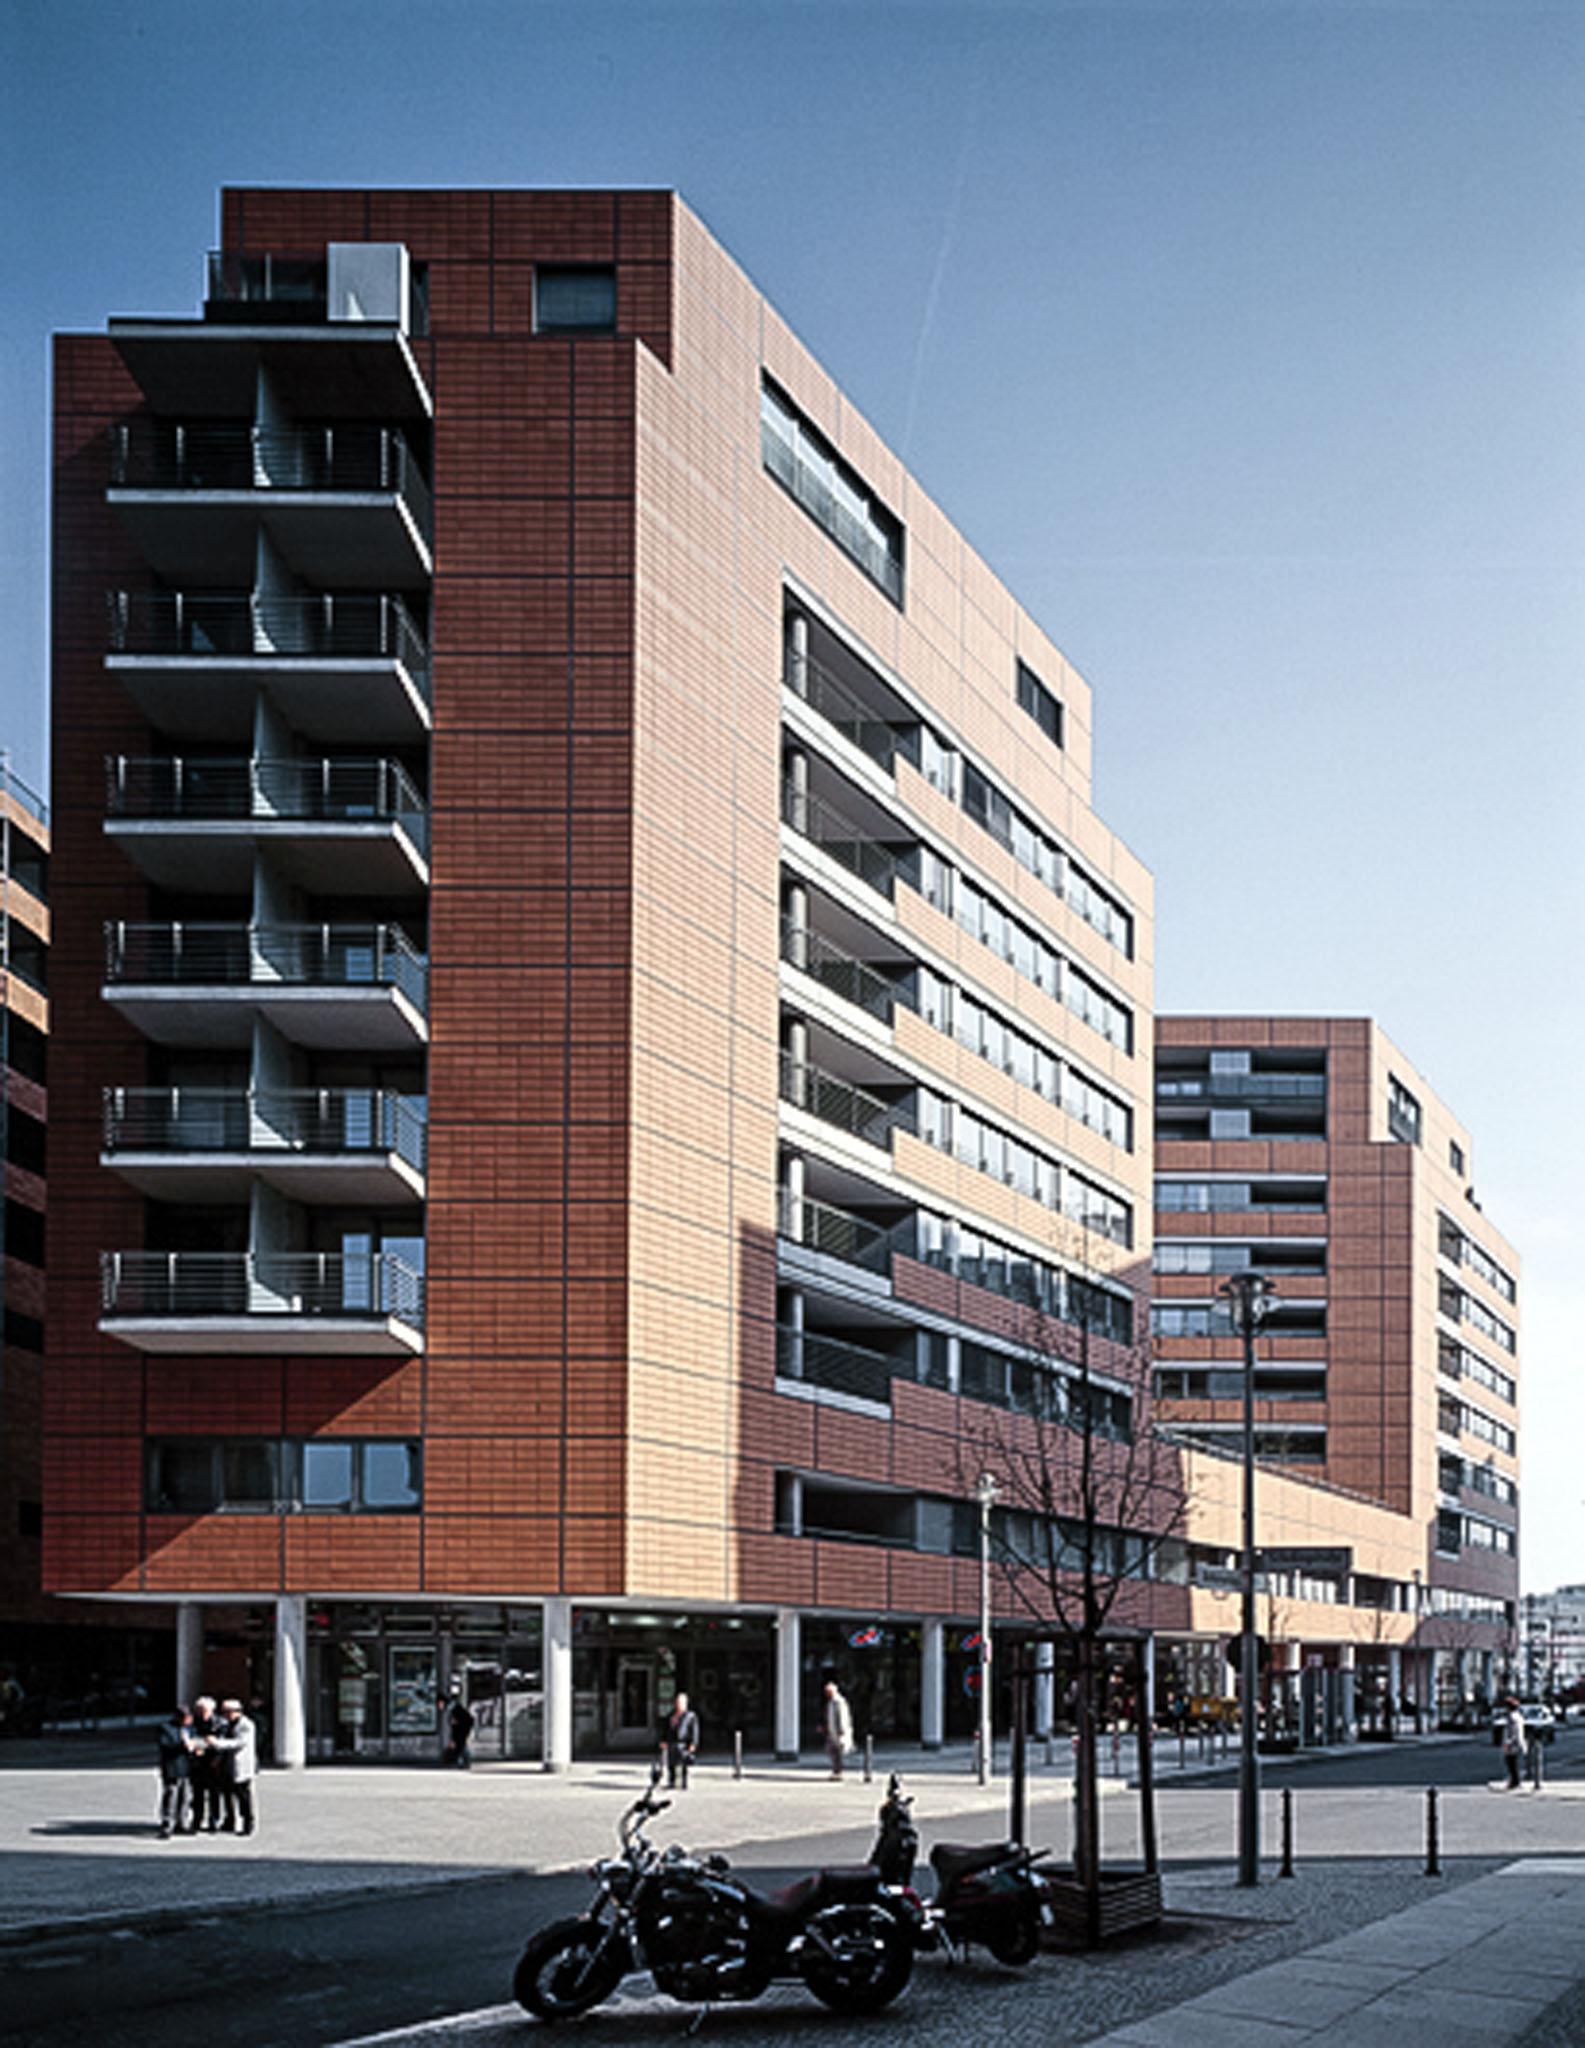 B9 Potsdamer Platz 2